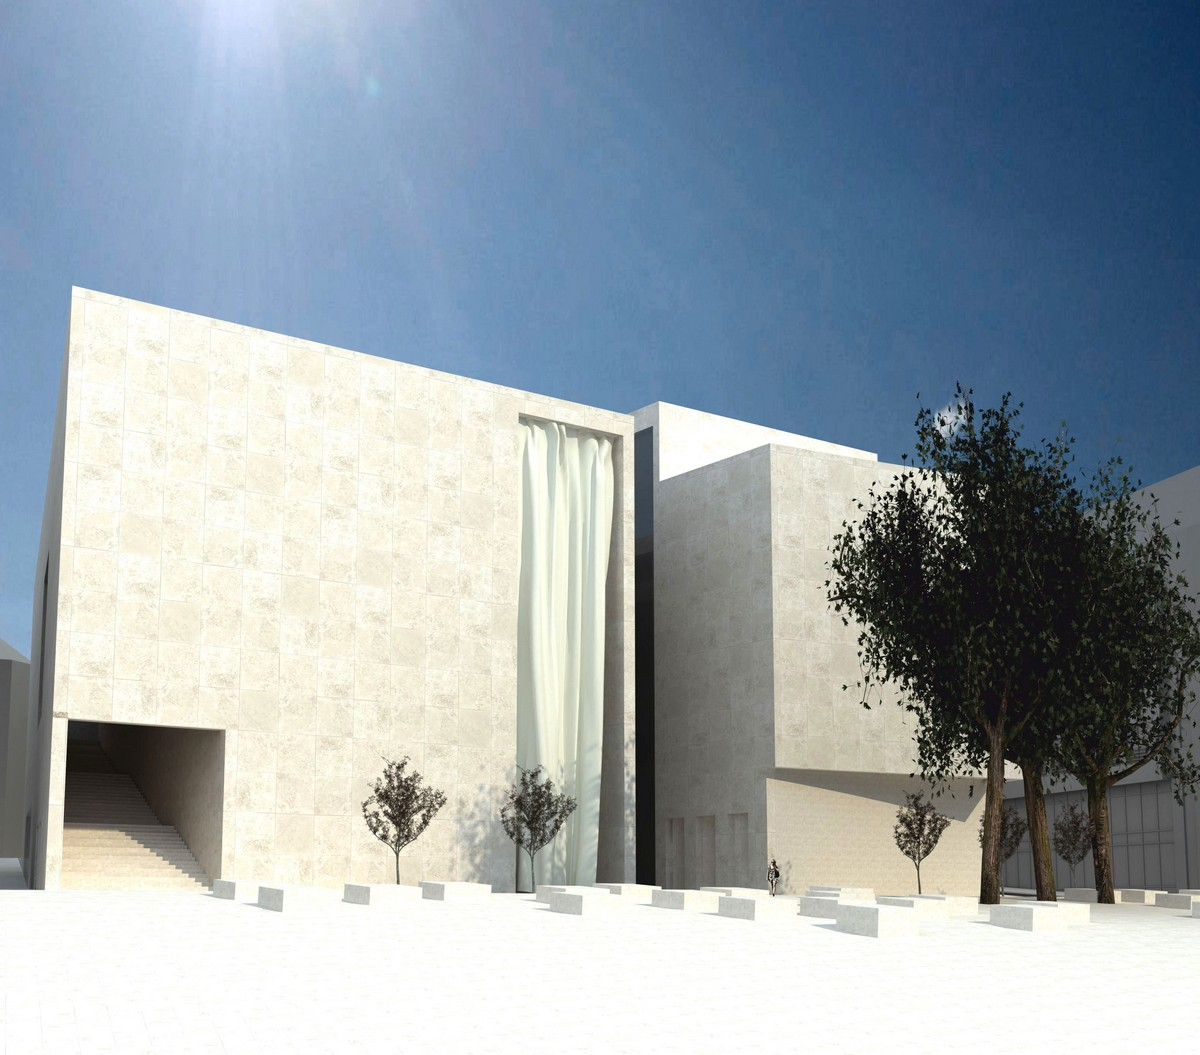 dom mody prostoarchitekci (8)